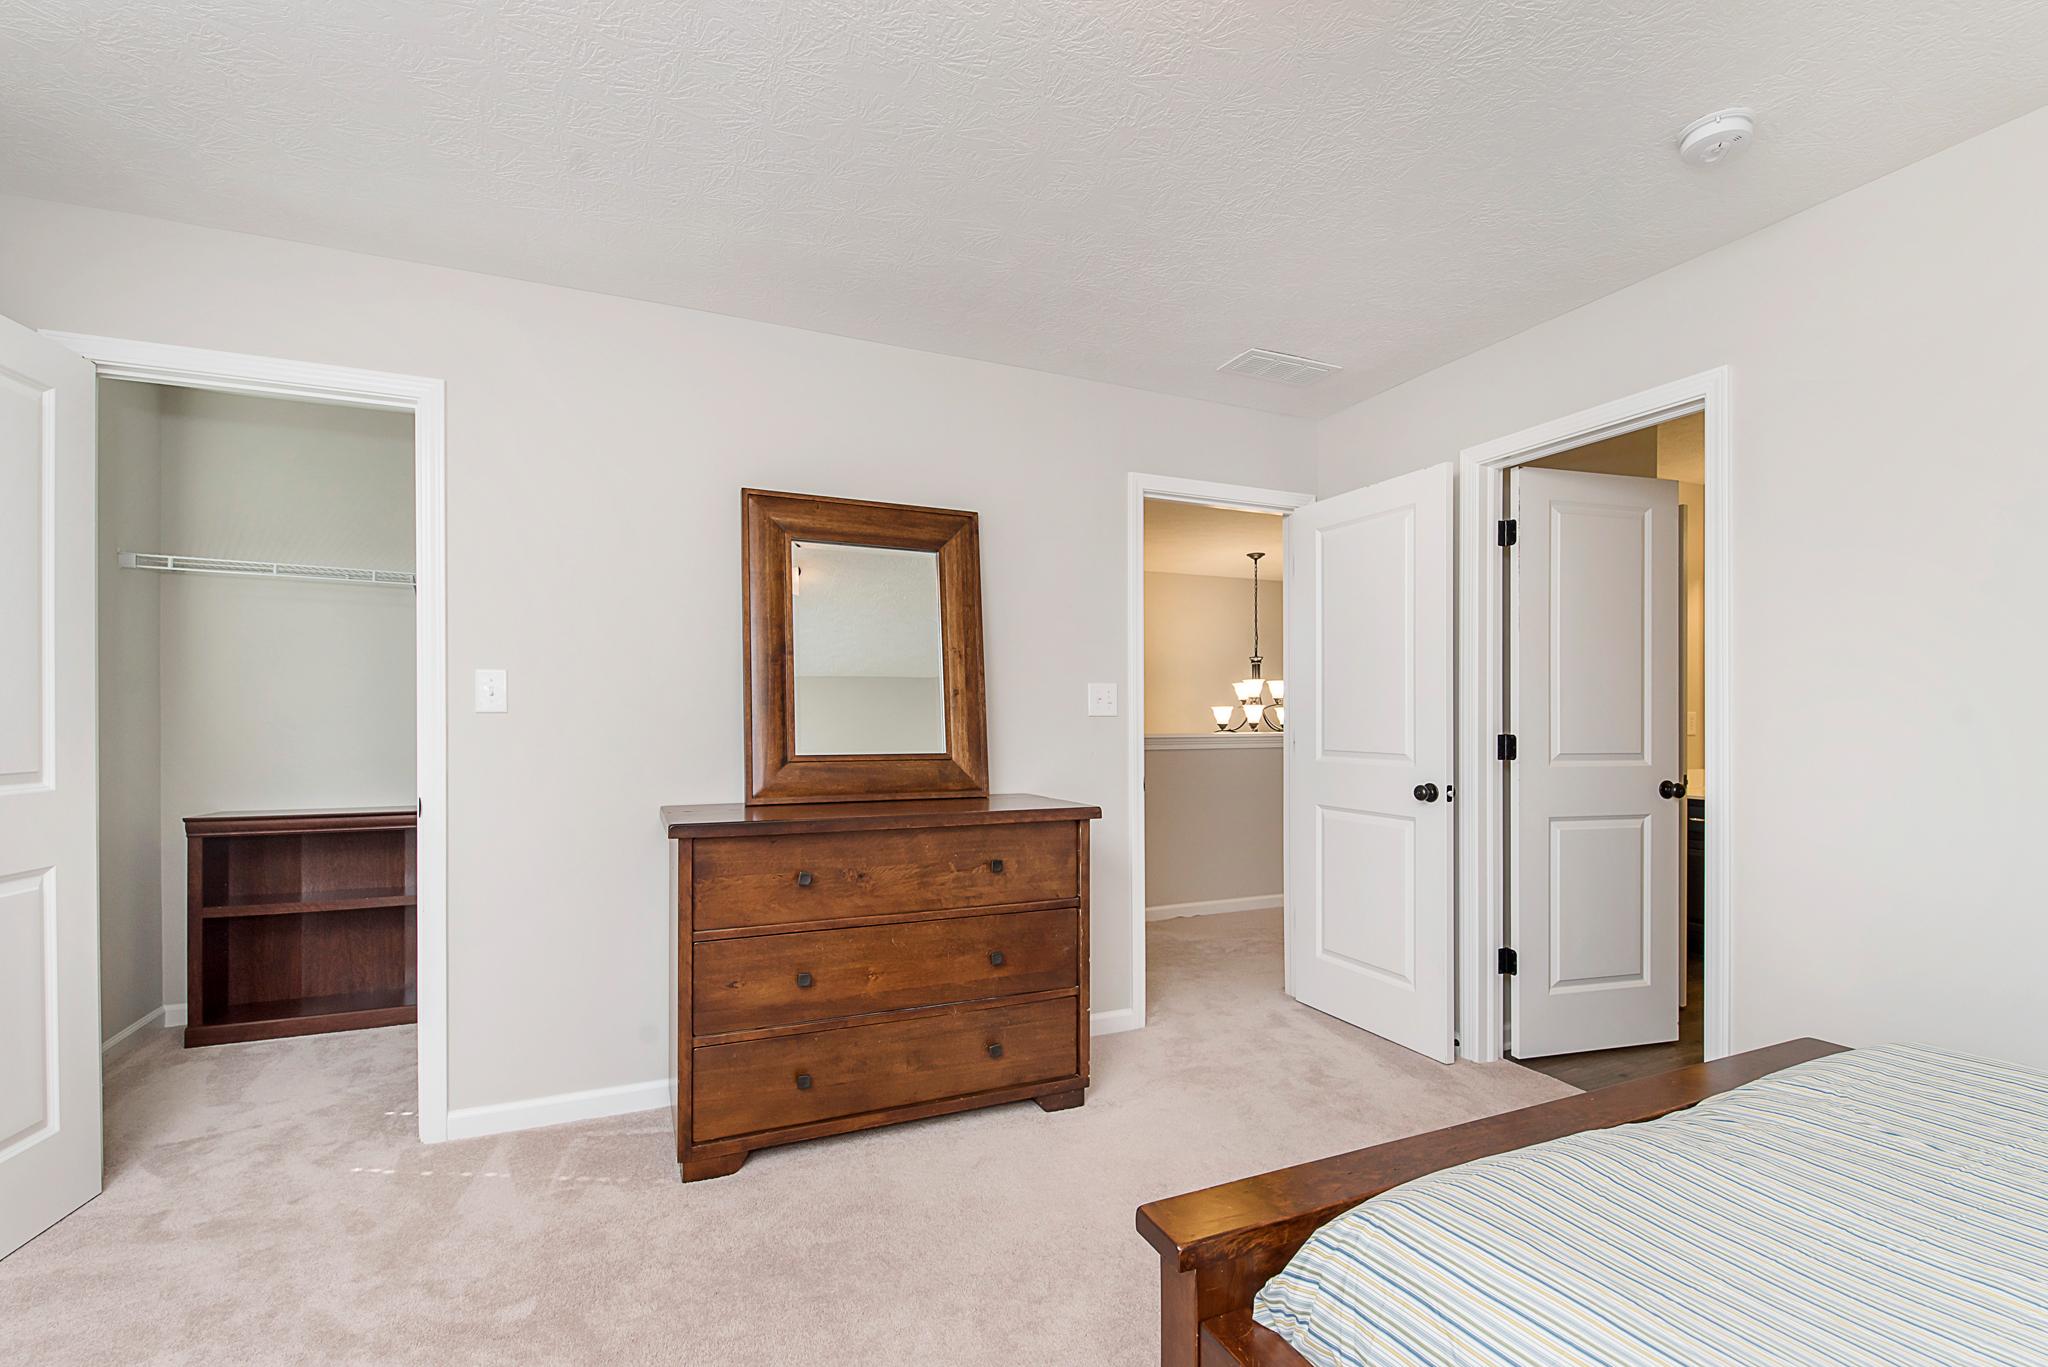 25_Bedroom 3.jpg